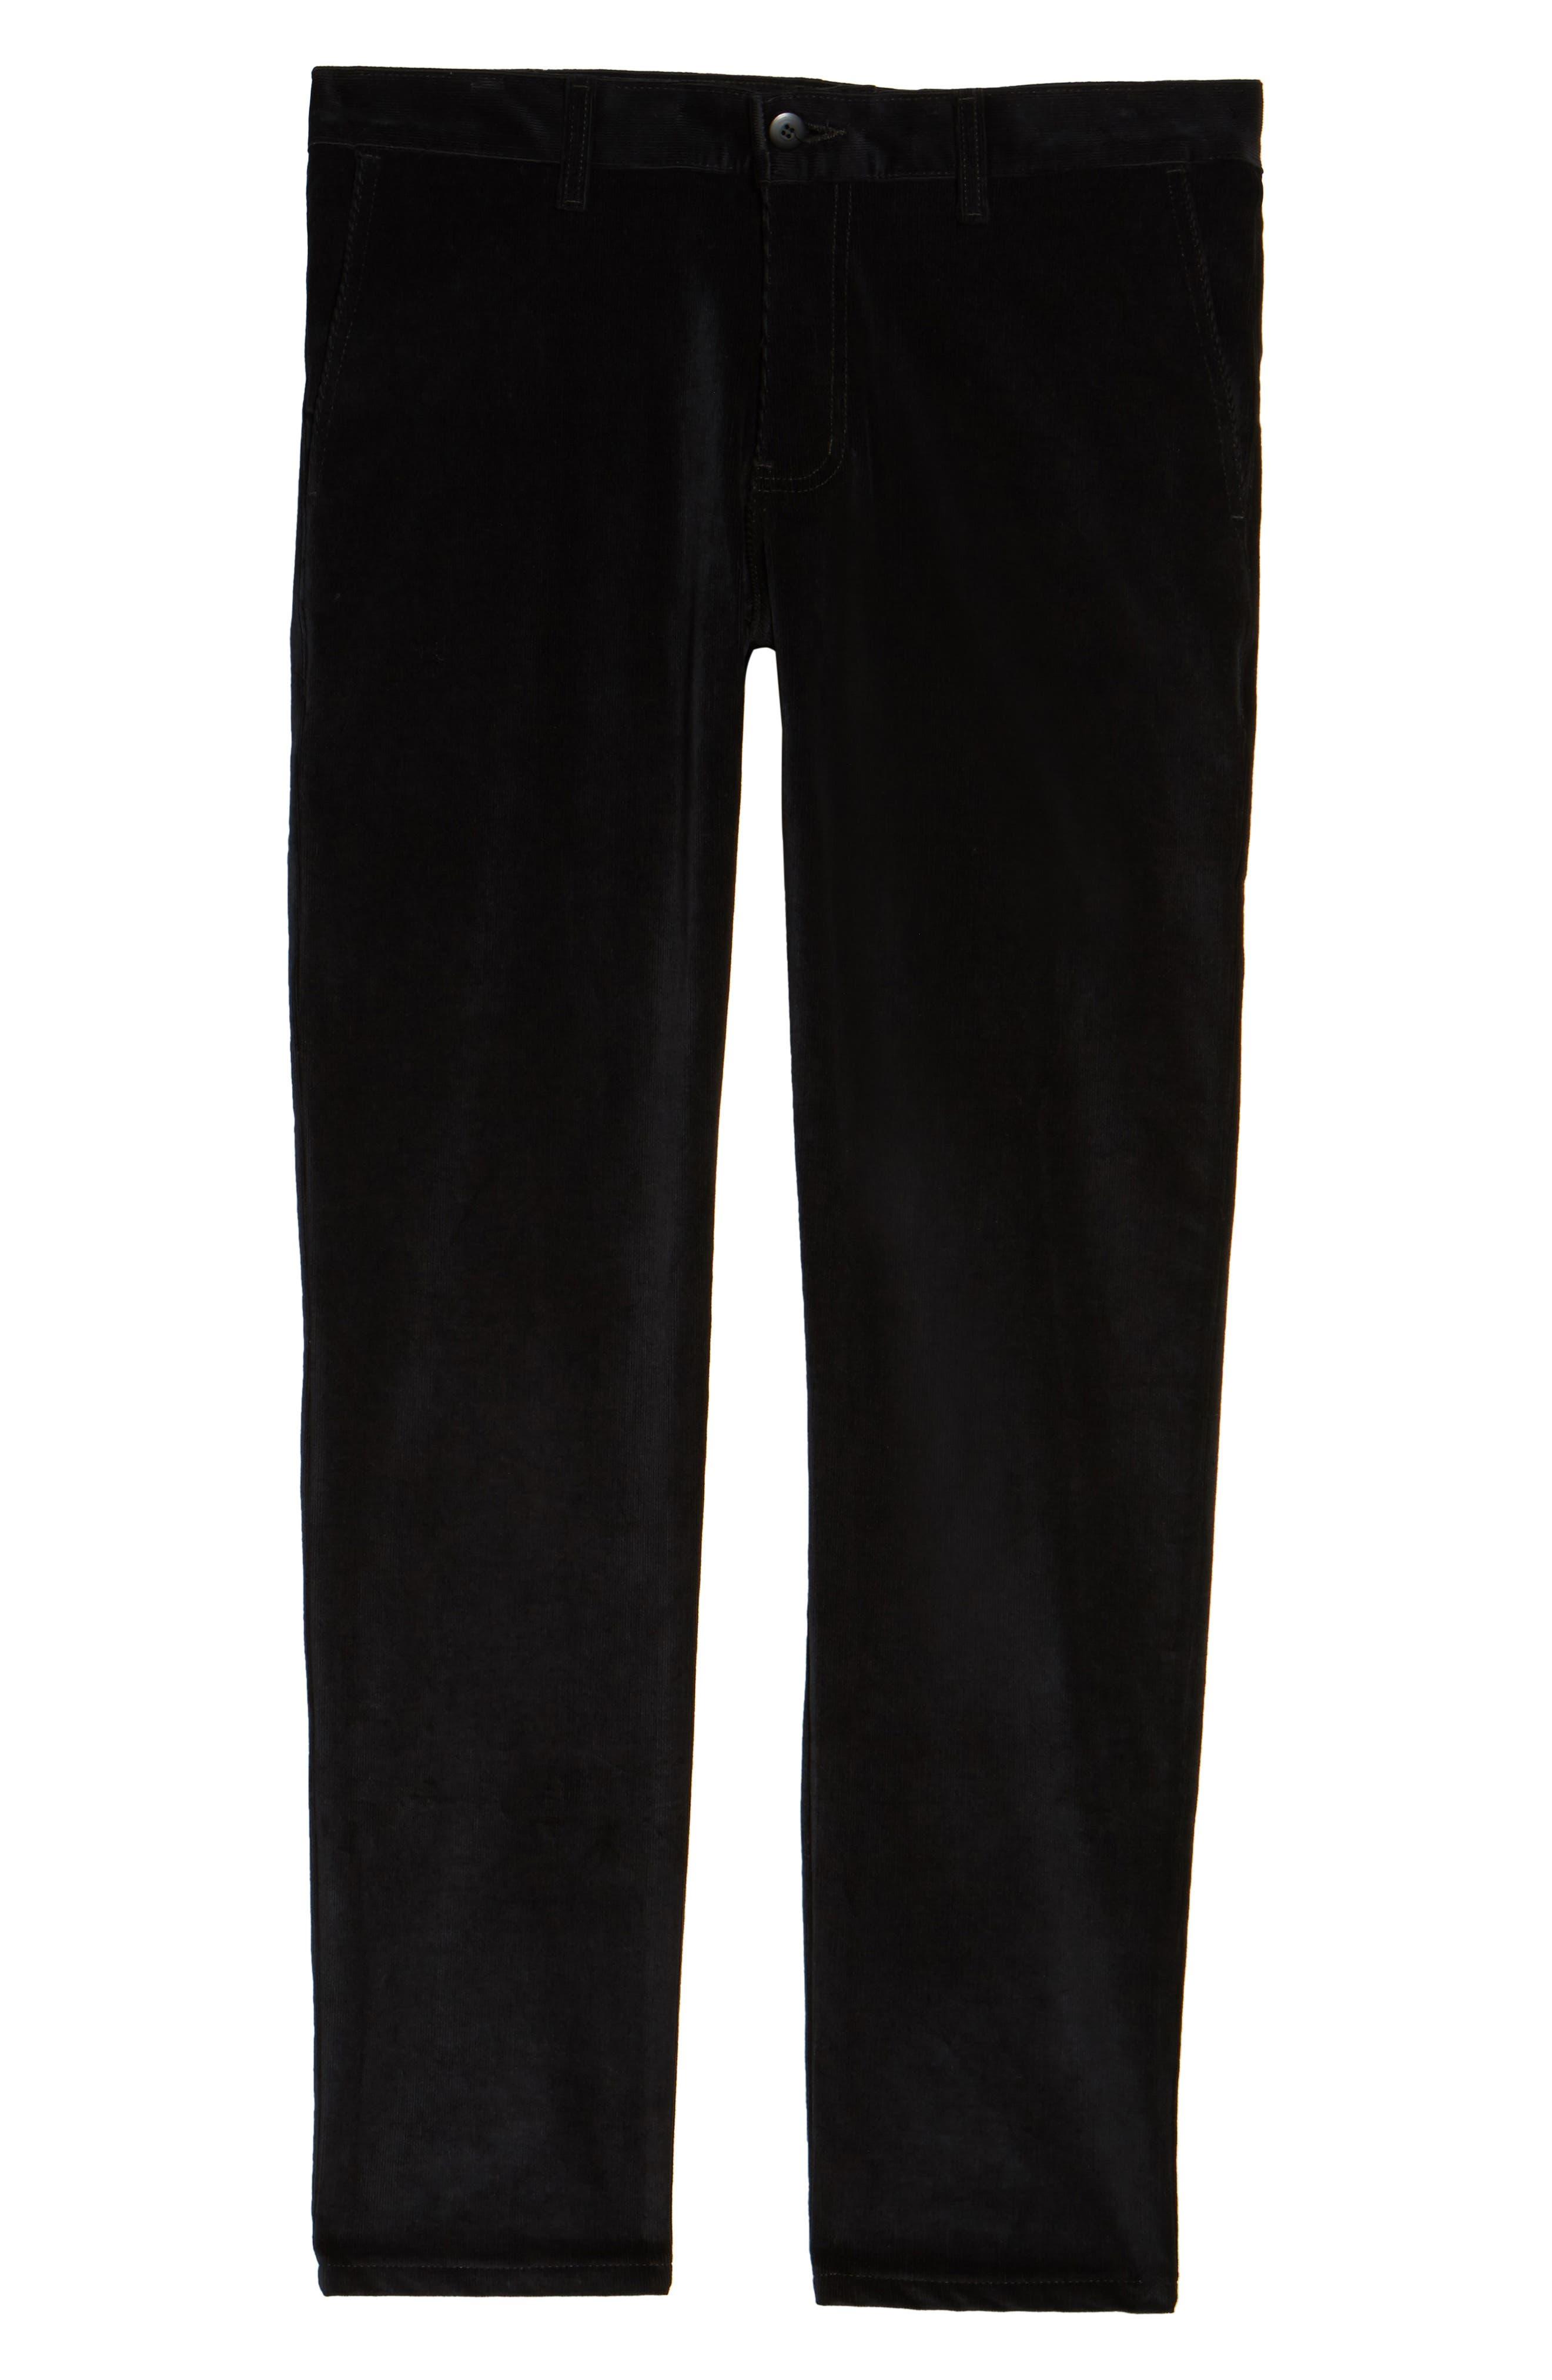 Naked & Famous Slim Chino Slim Fit Corduroy Pants,                             Alternate thumbnail 6, color,